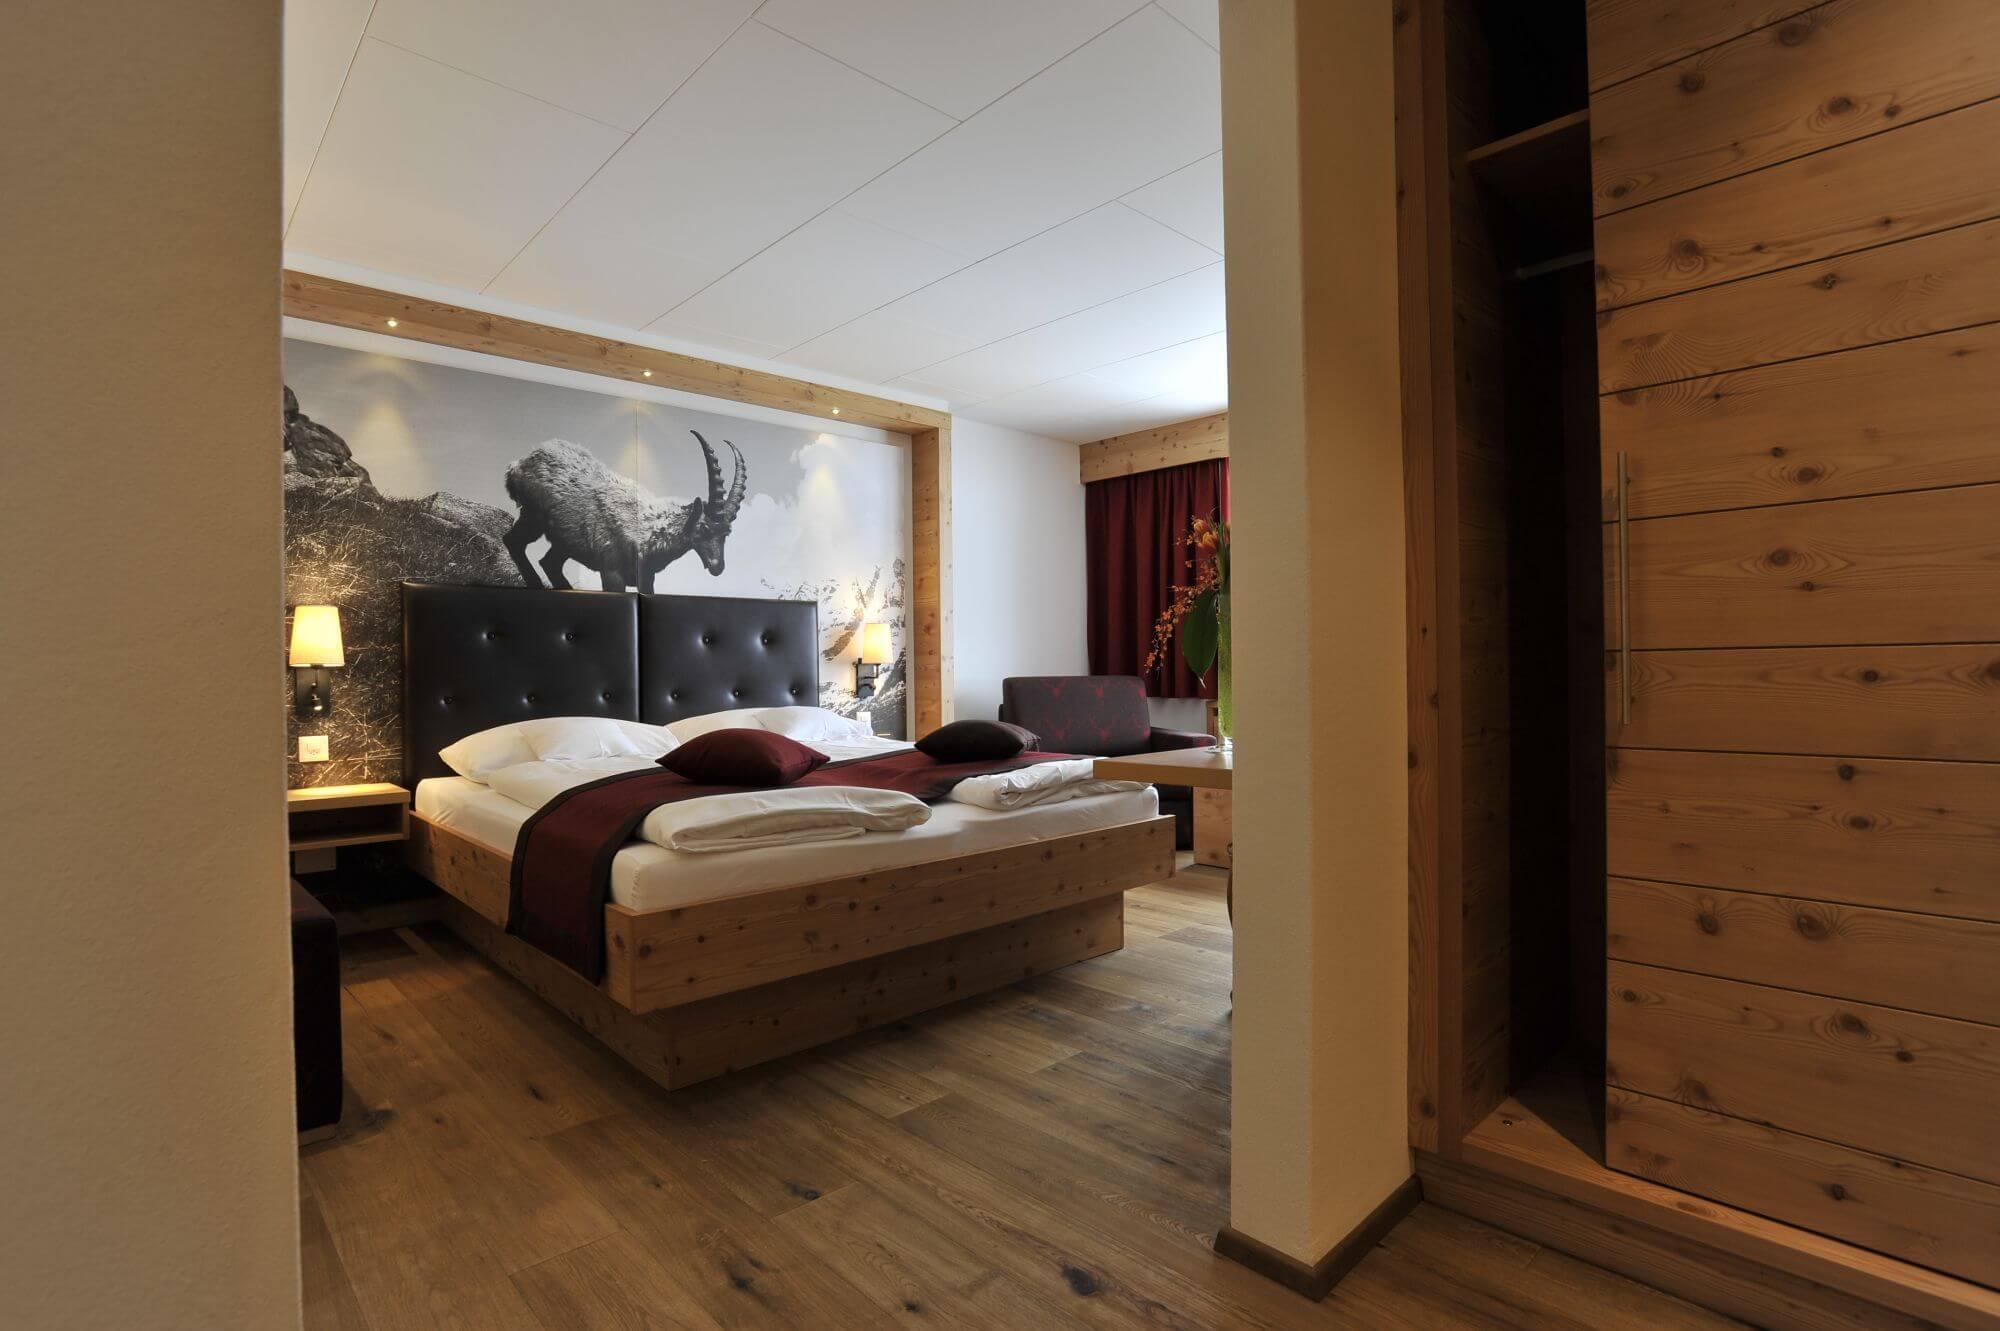 3-tage-im-blatters-hotel-in-arosa